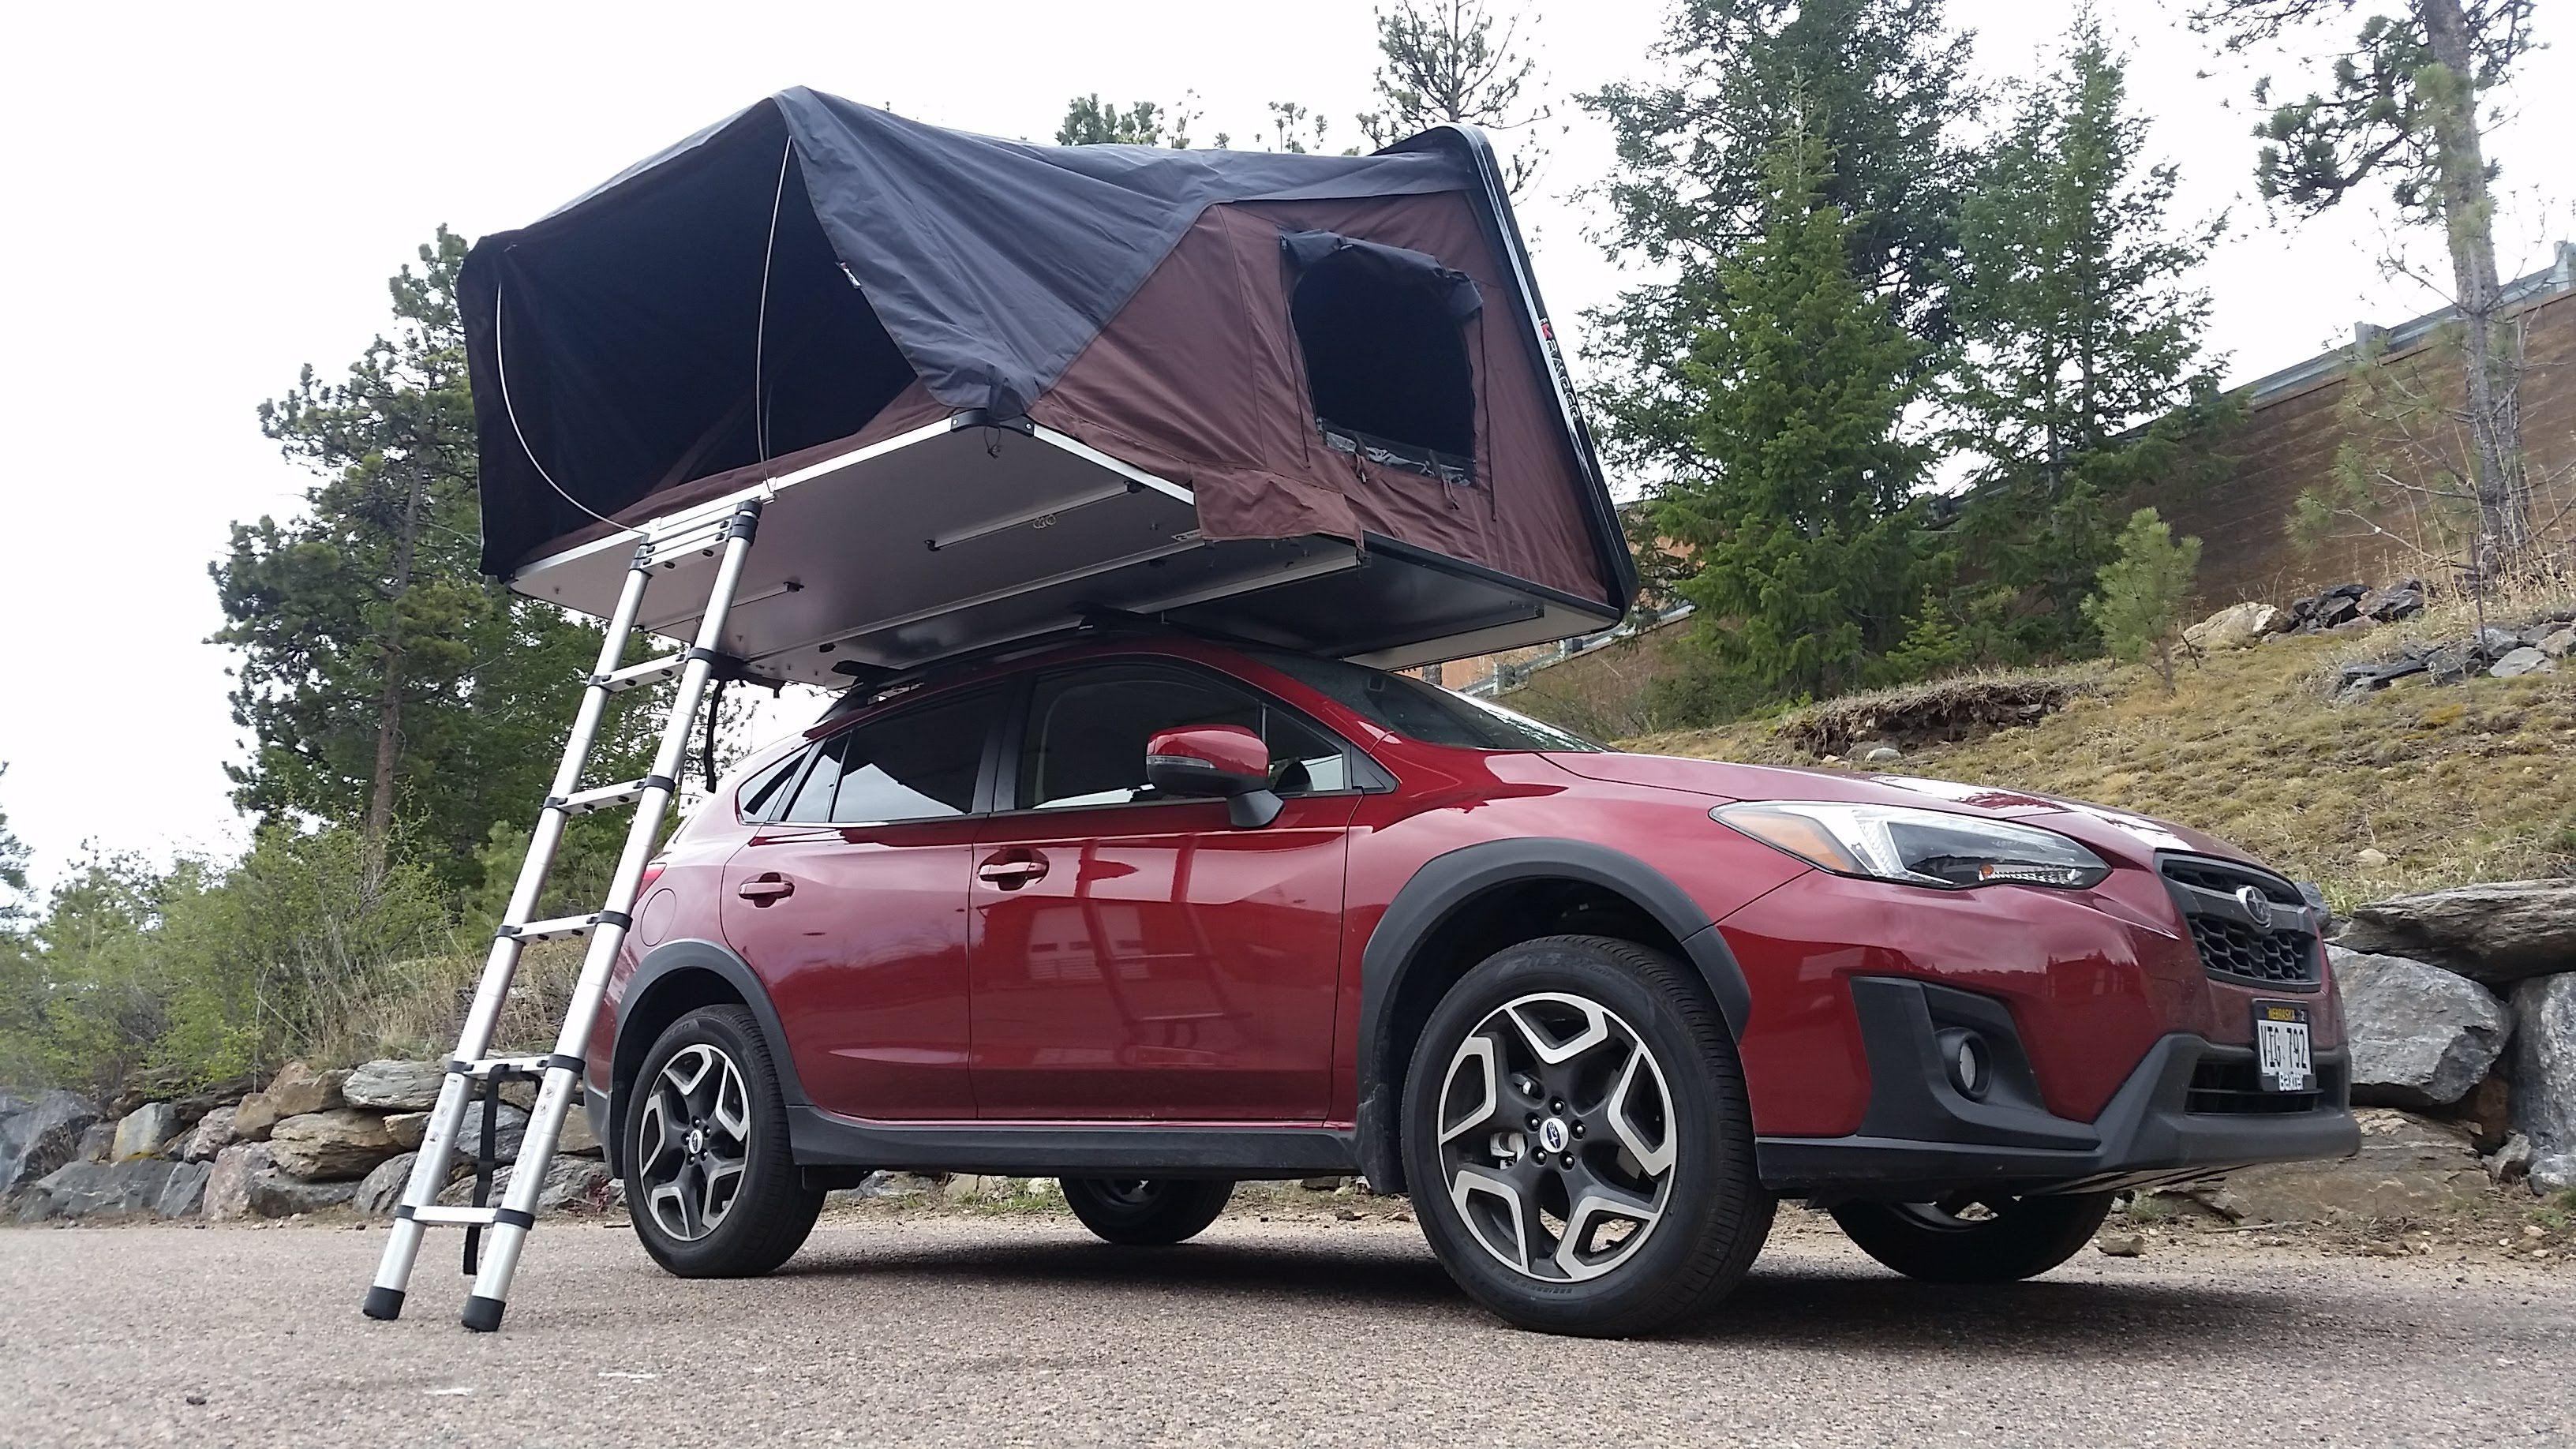 4 Person Hardshell Rooftop Tent On A Subaru Crosstrek Ikamper Skycamp Sets Up In Under 1 Minute And Has A King Size Matt Roof Top Tent Subaru Crosstrek Tent